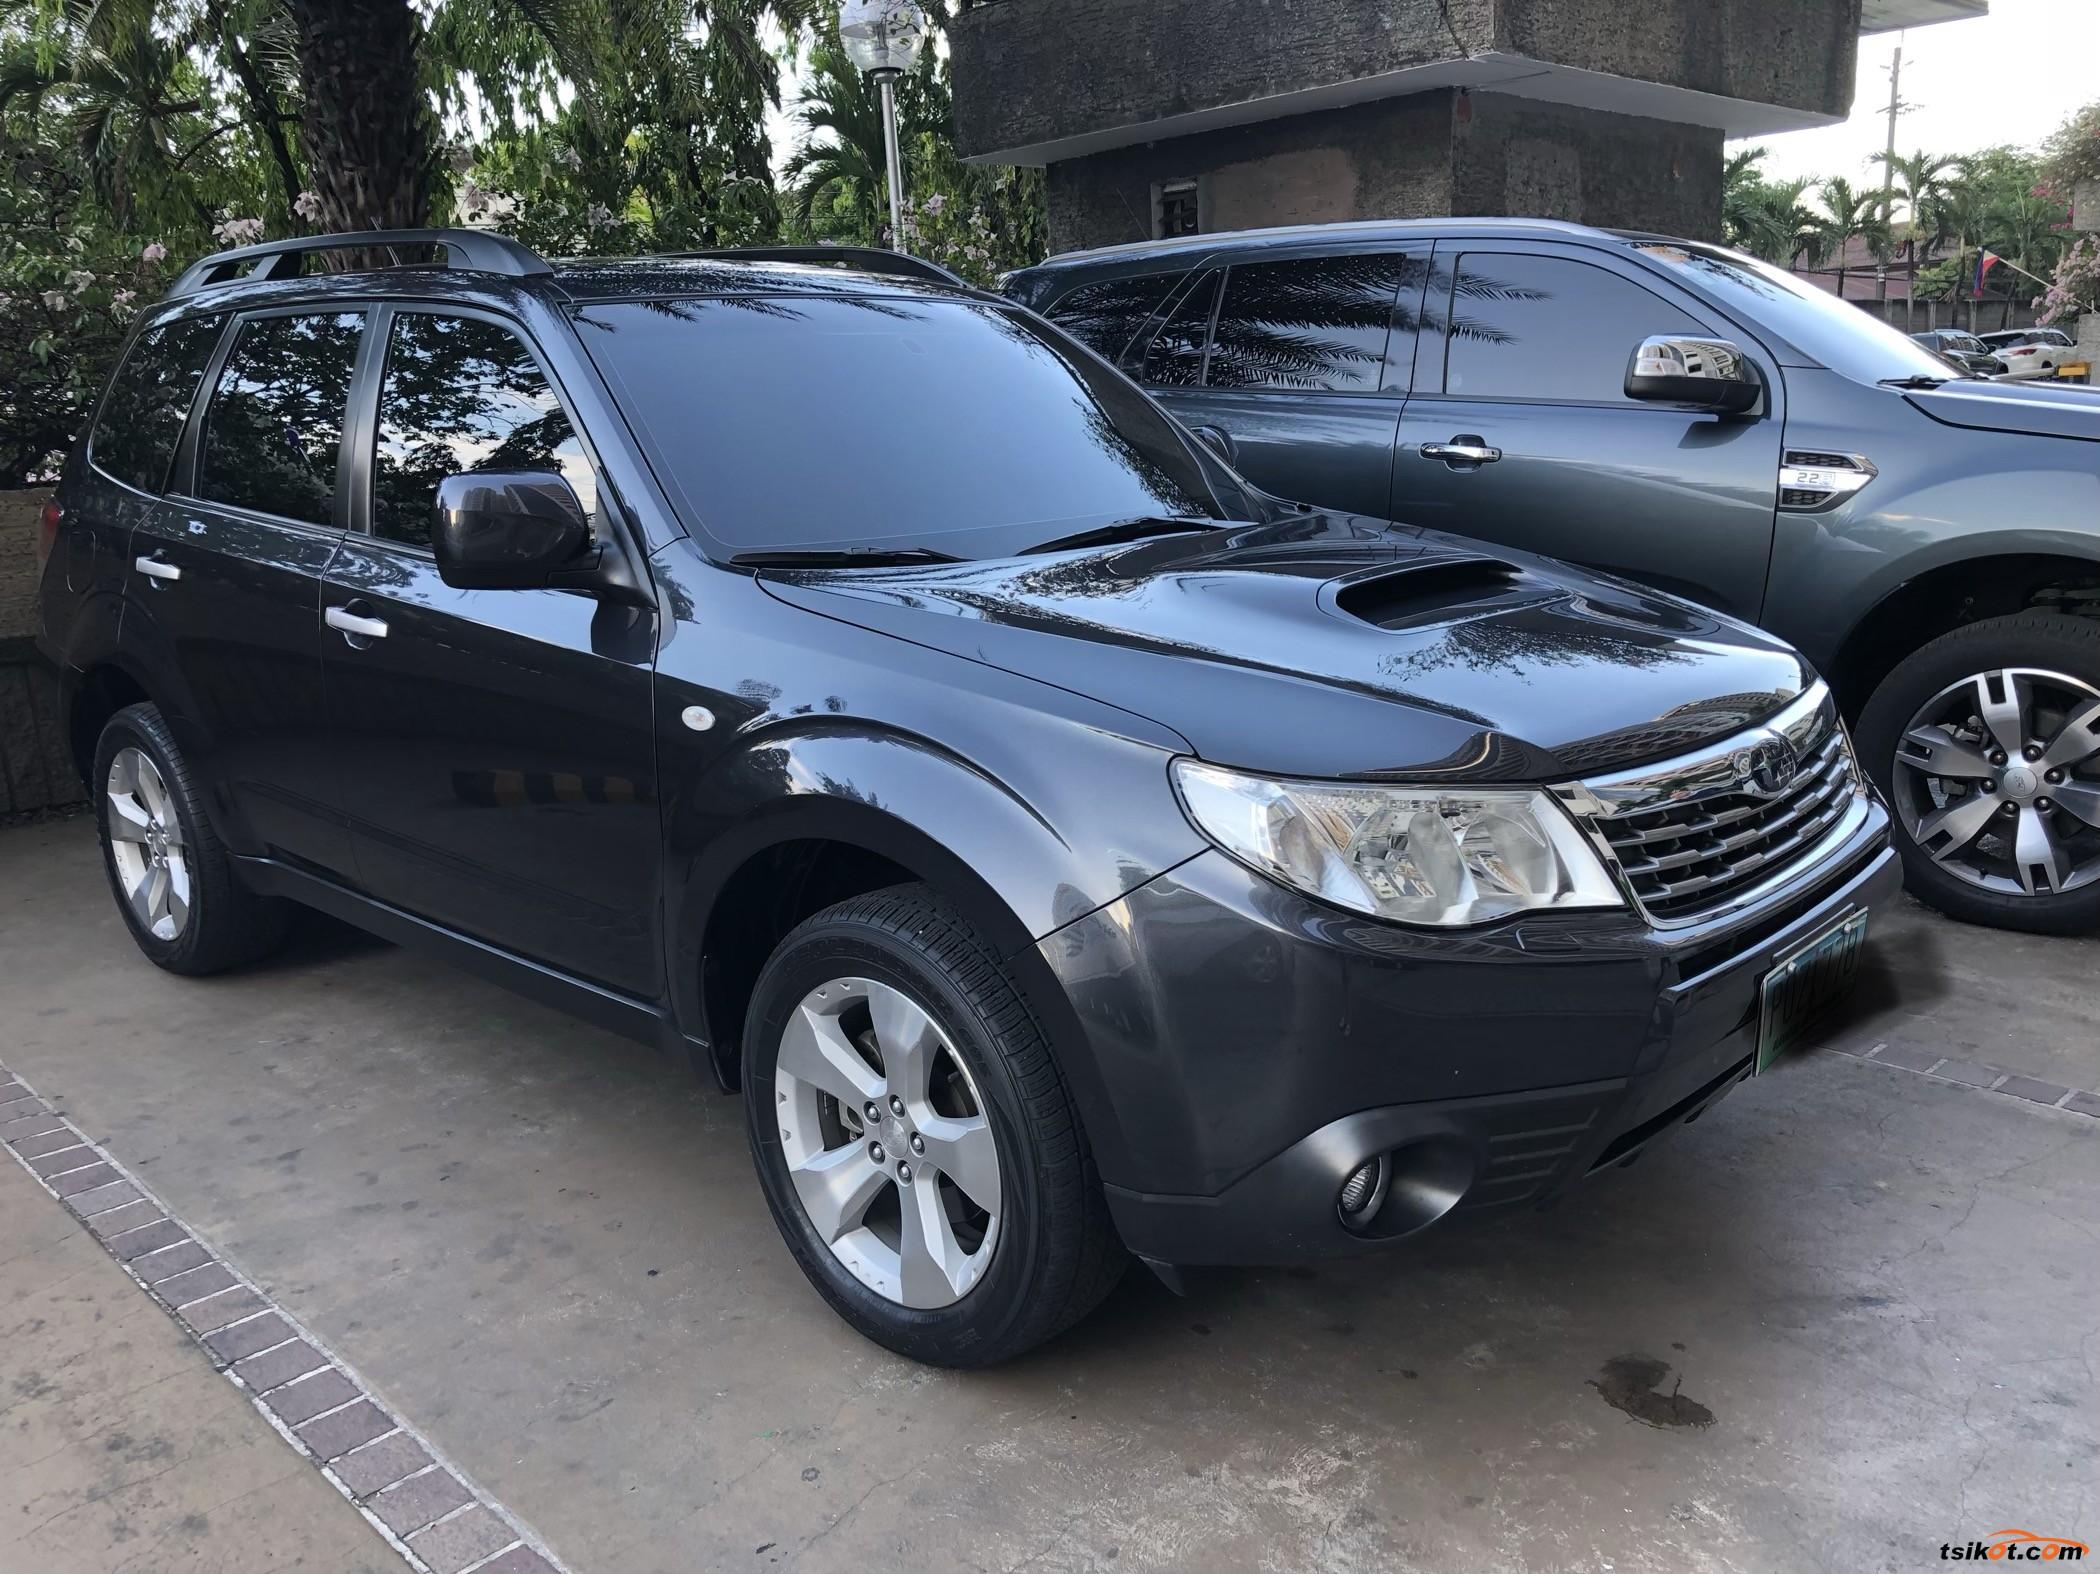 Subaru Forester 2011 - 1